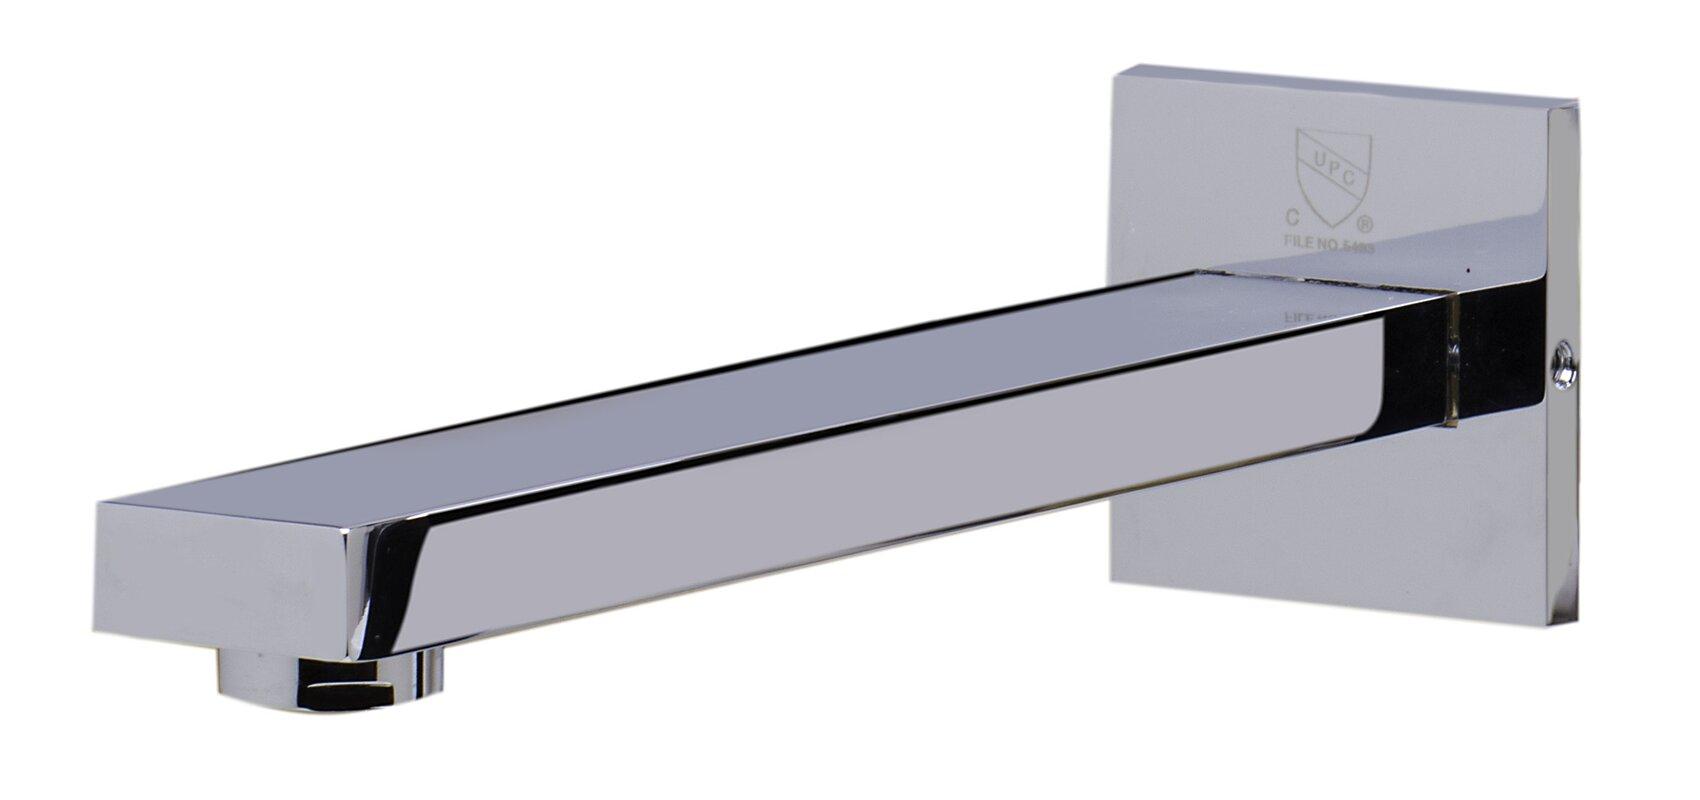 Alfi Brand Wall Mounted Bathroom Faucet & Reviews | Wayfair